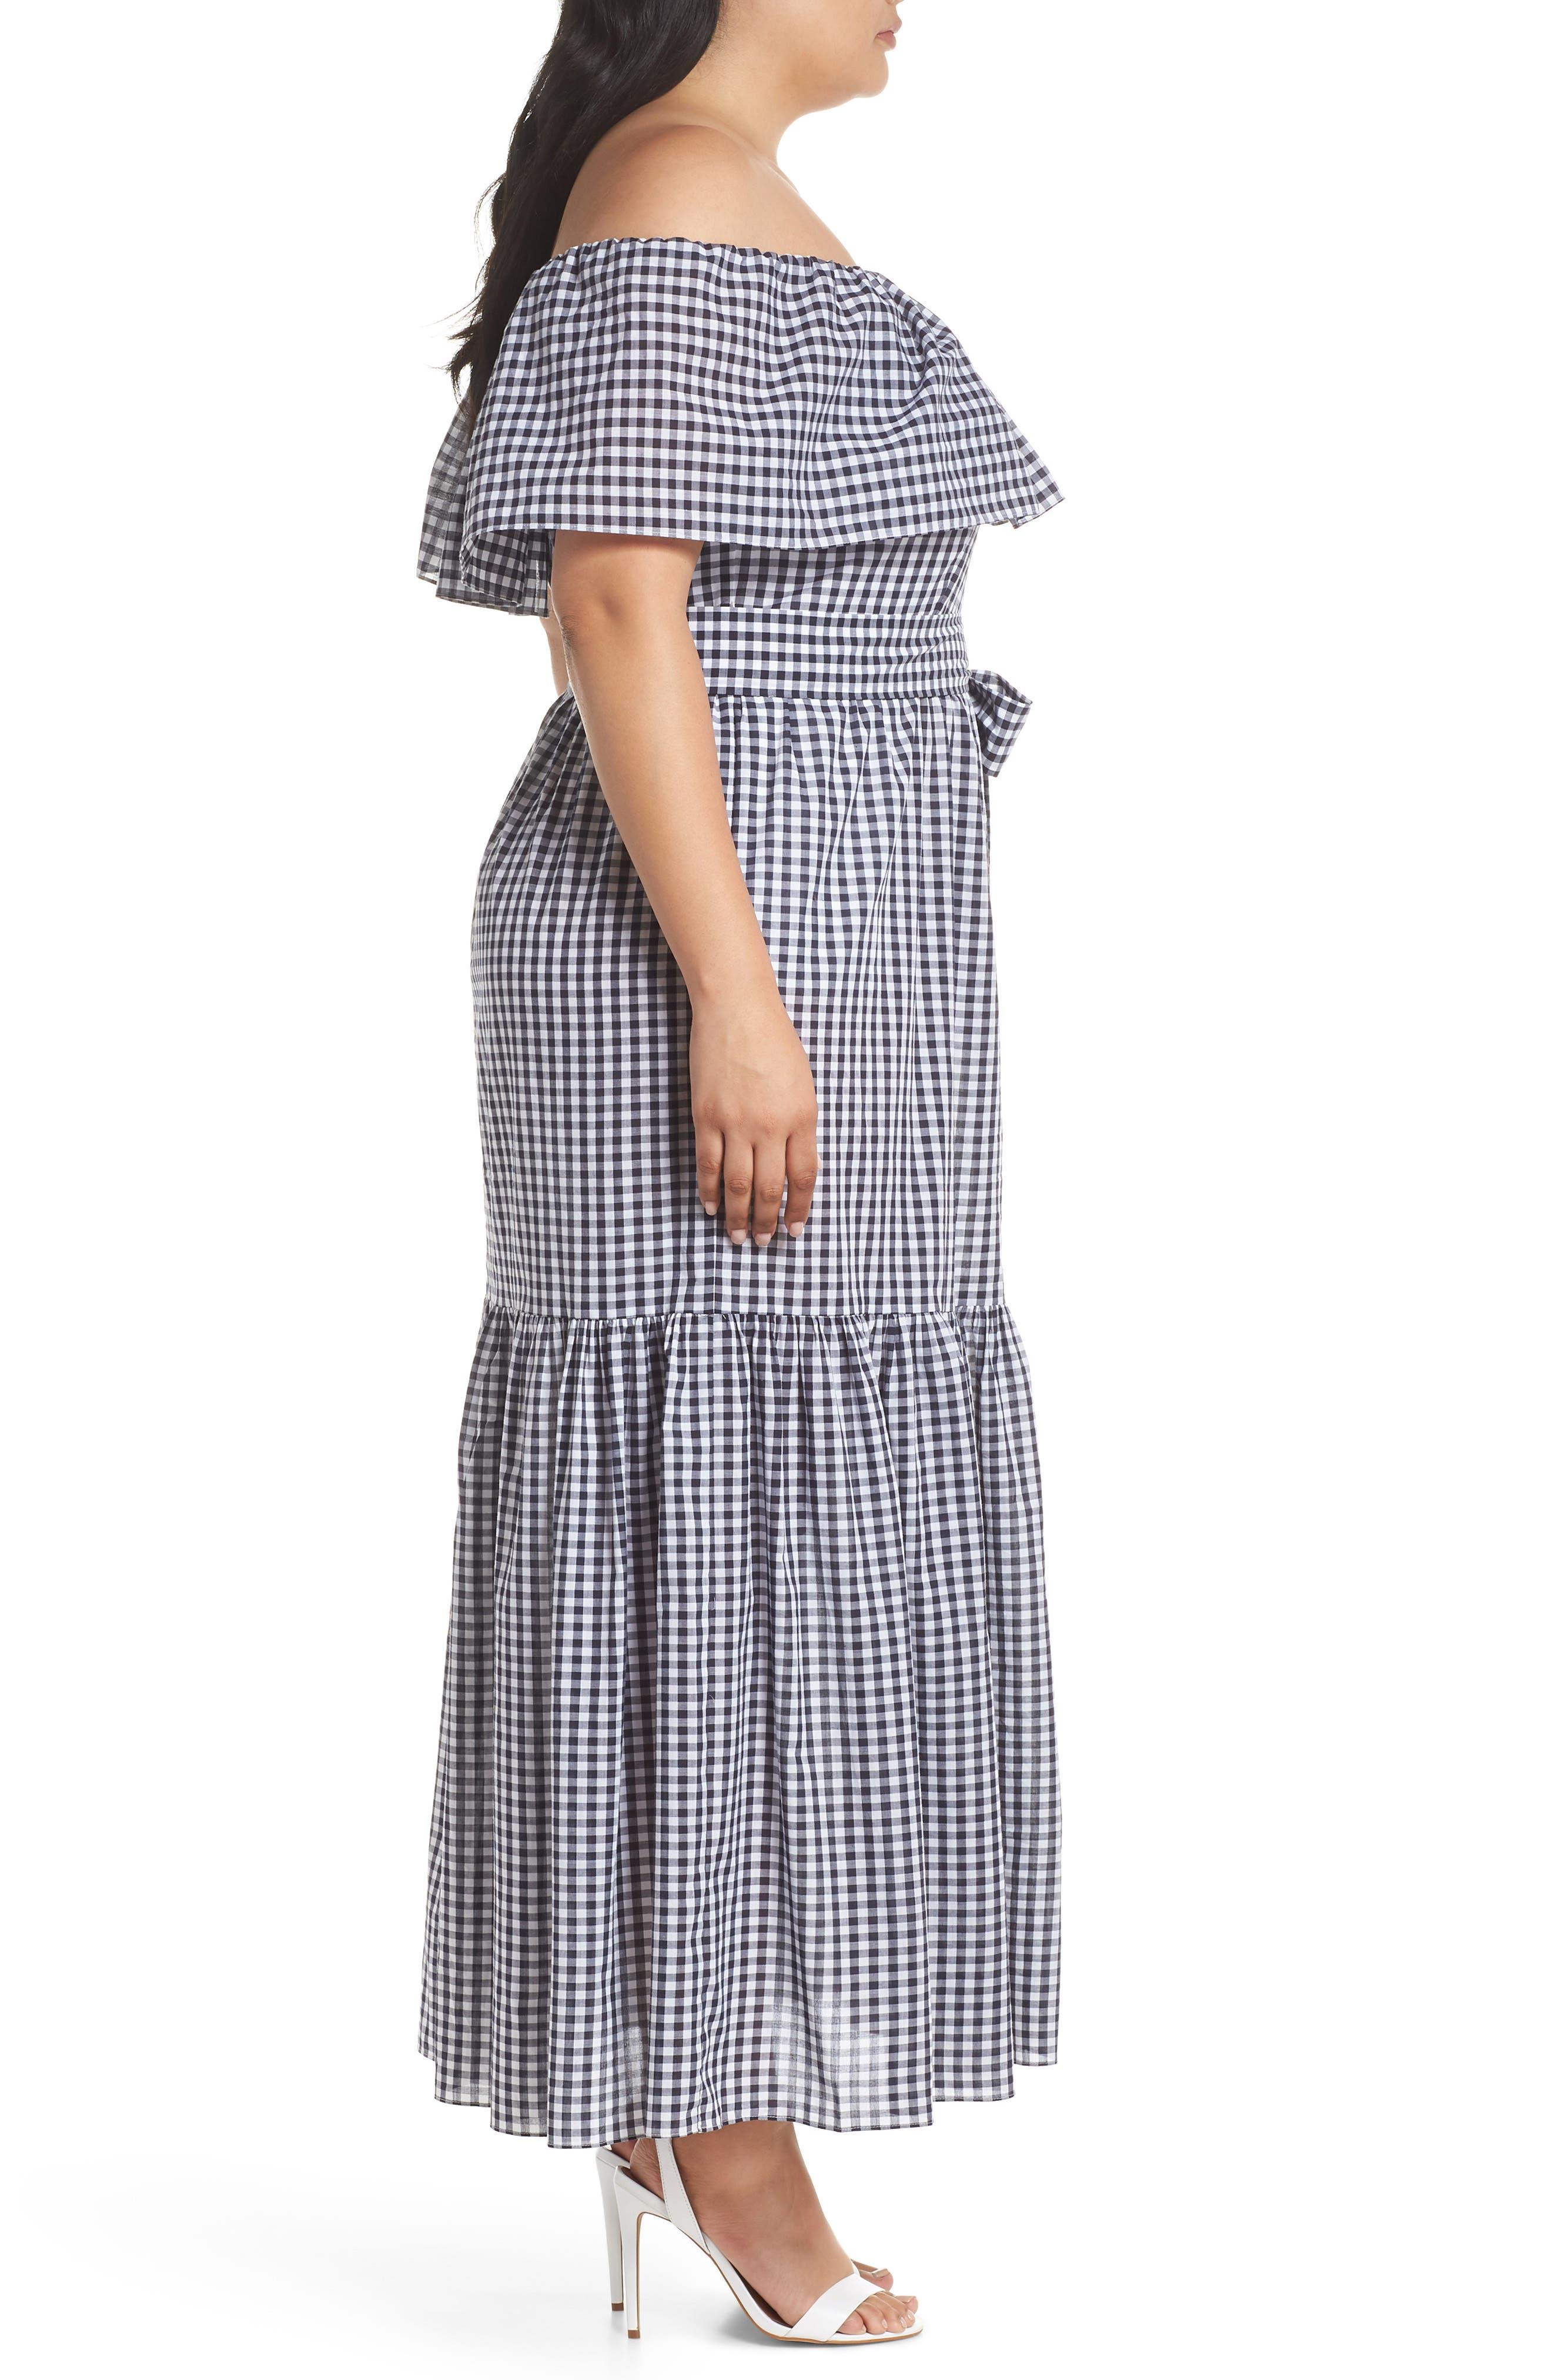 Off the Shoulder Gingham Maxi Dress,                             Alternate thumbnail 3, color,                             Blue White Gingham